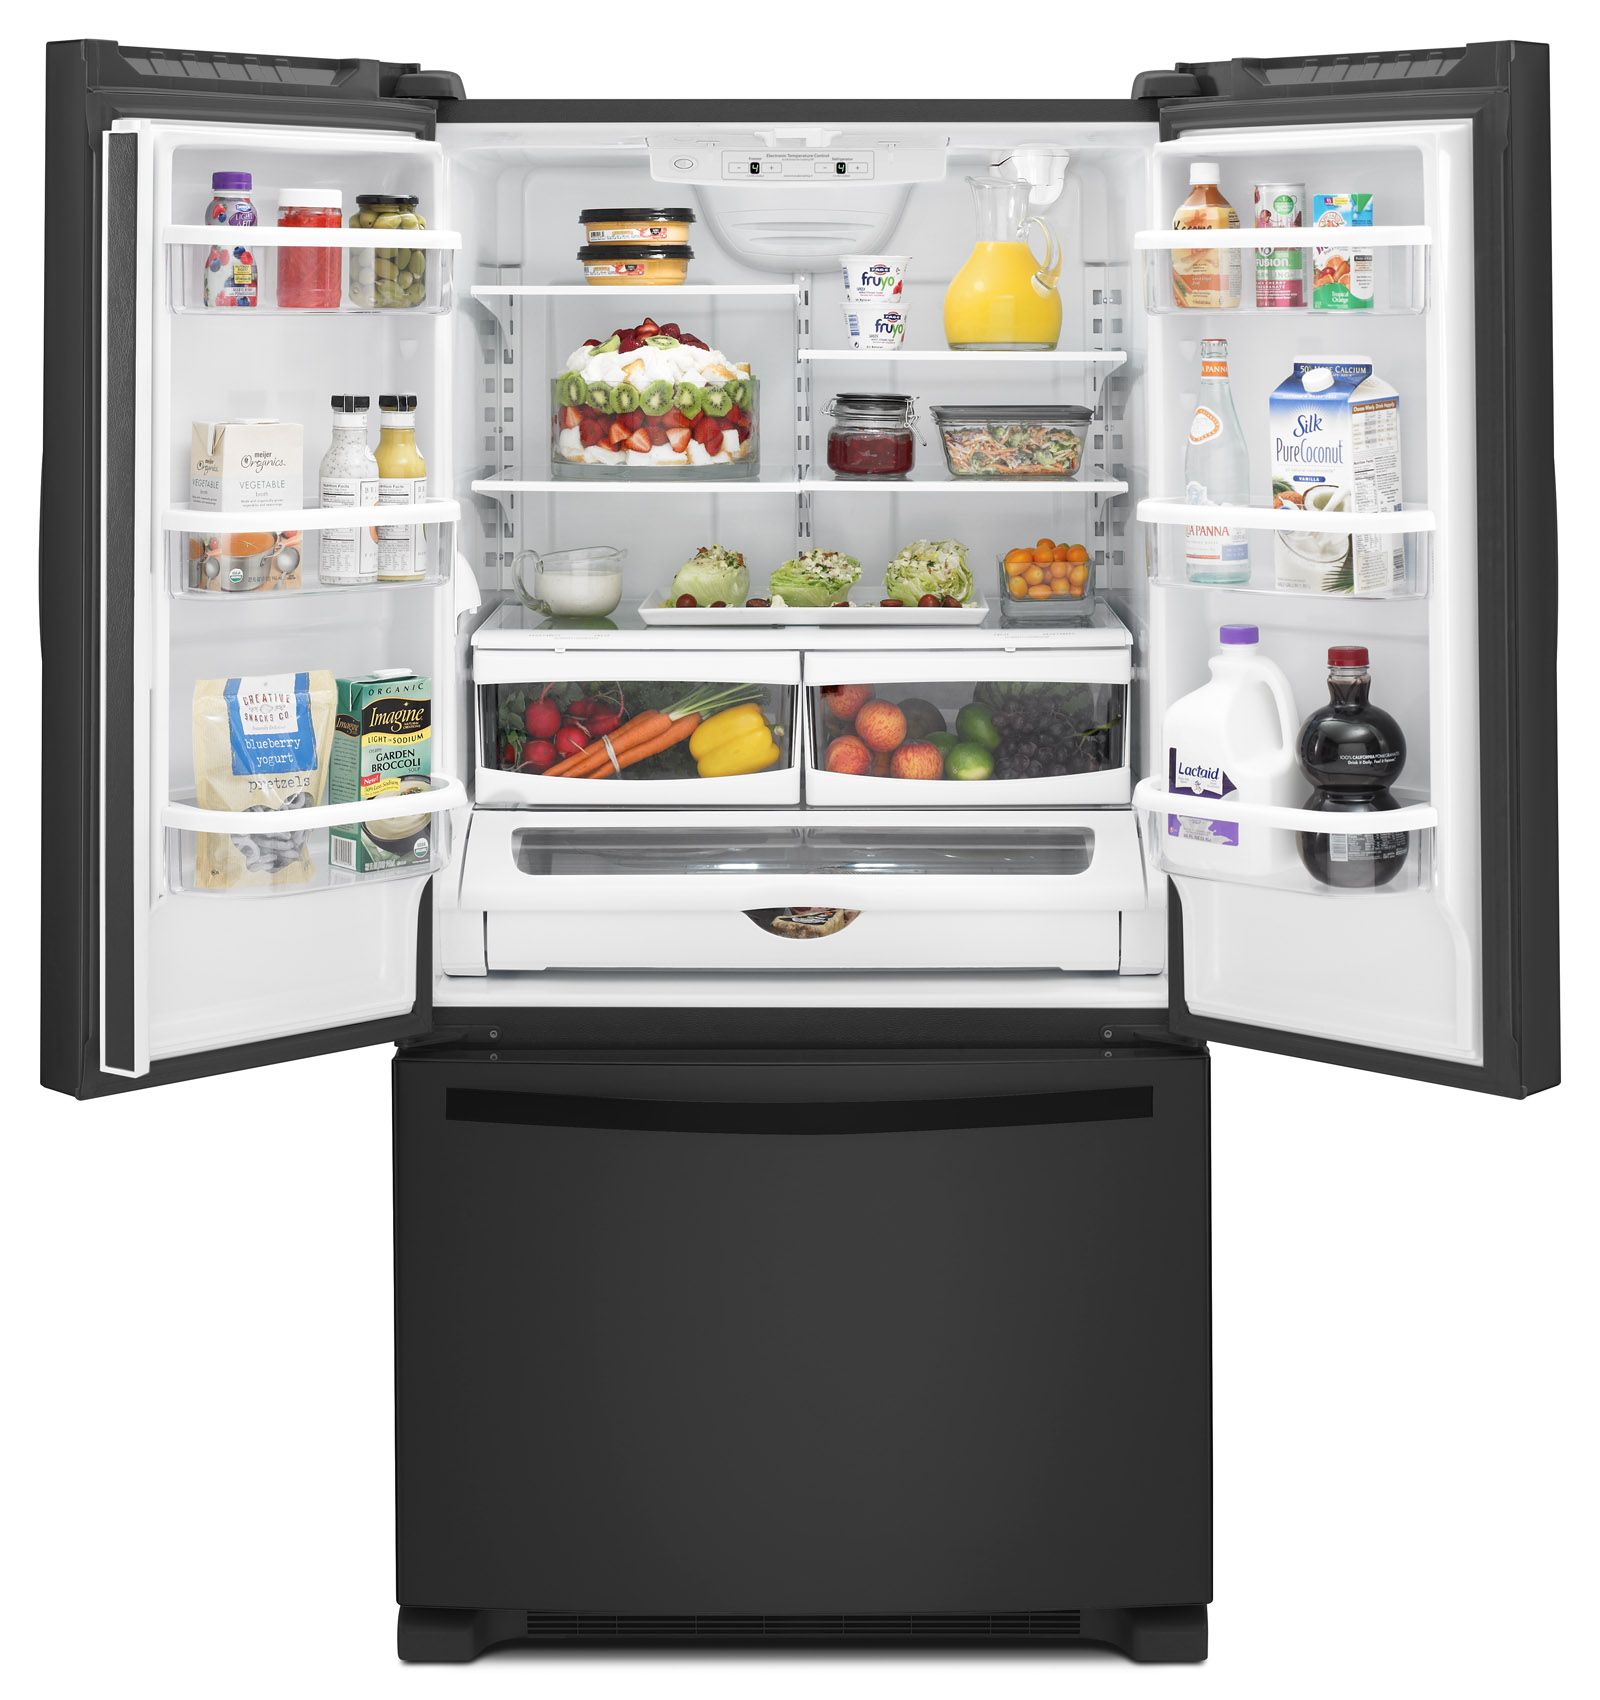 Whirlpool WRF535SWBB 25 cu. ft. French Door Refrigerator w/ Interior Water Dispenser - Black